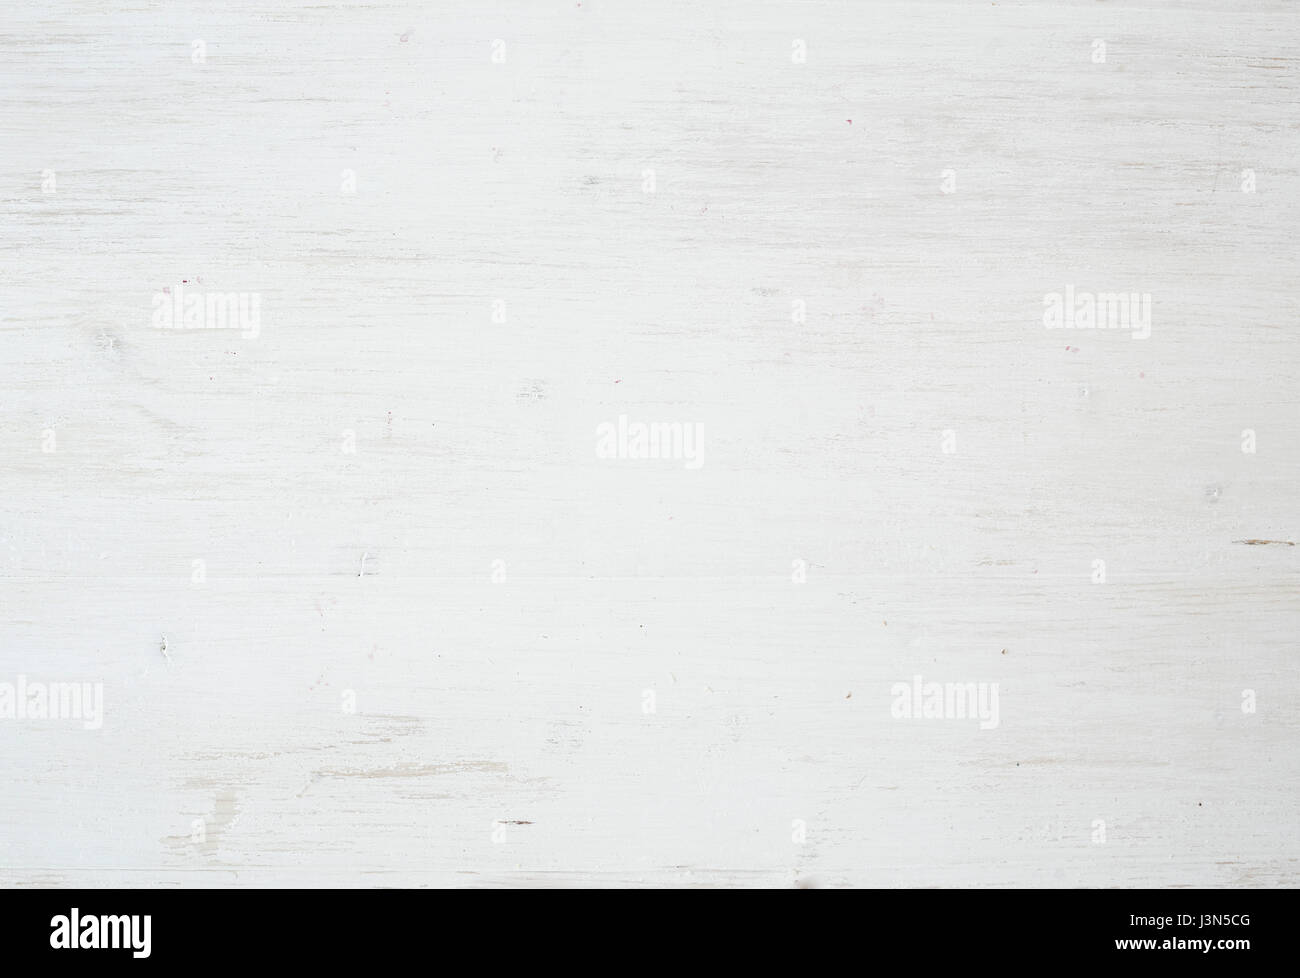 Wooden texture, white wood background with kitchen napkin, horizontal - Stock Image